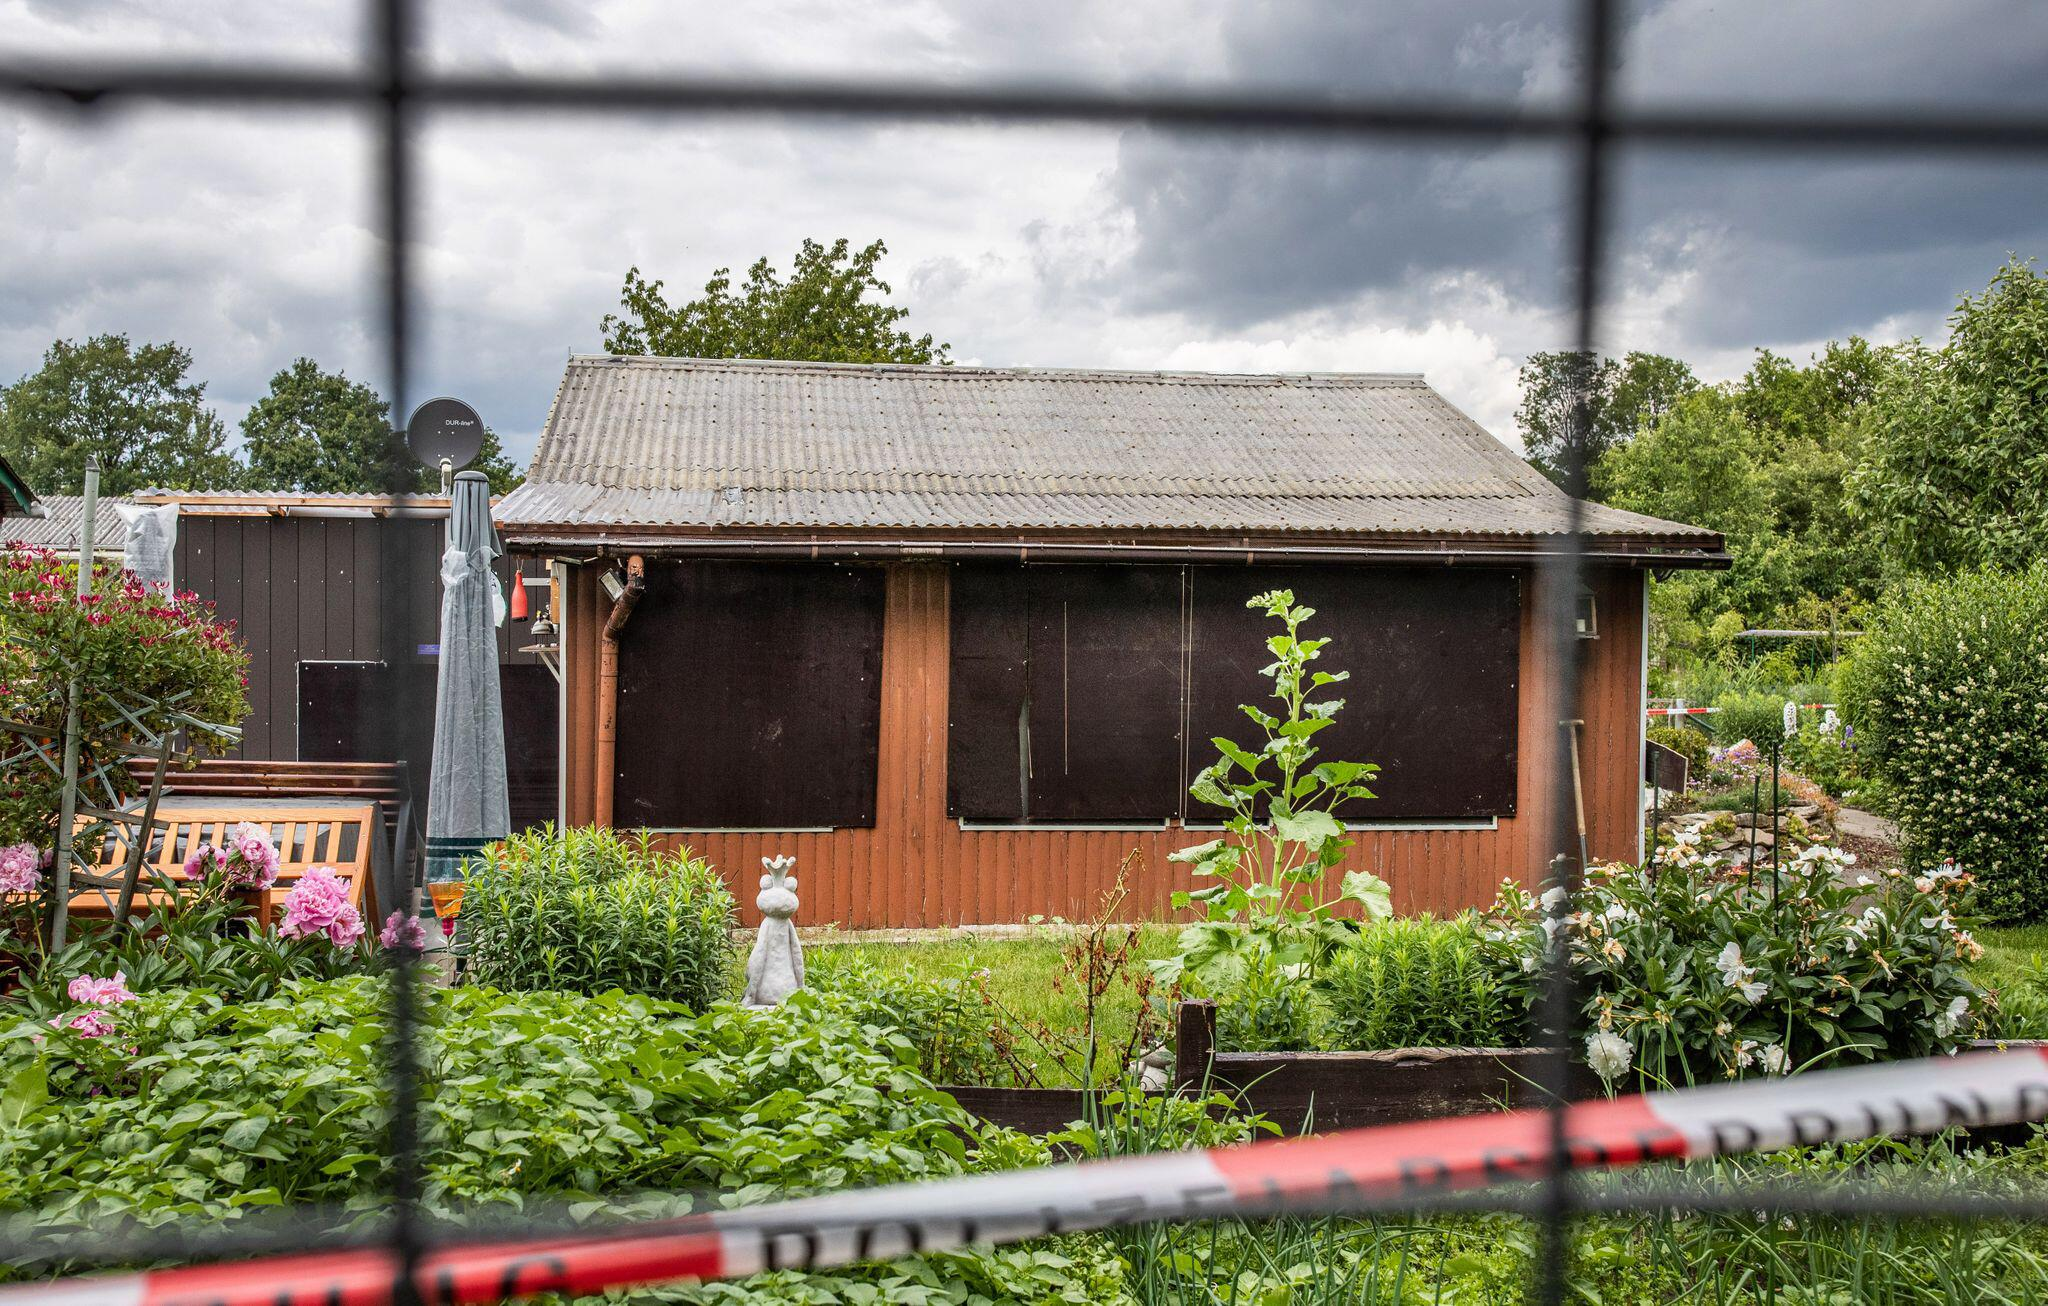 Bild zu Missbrauchsfall Münster